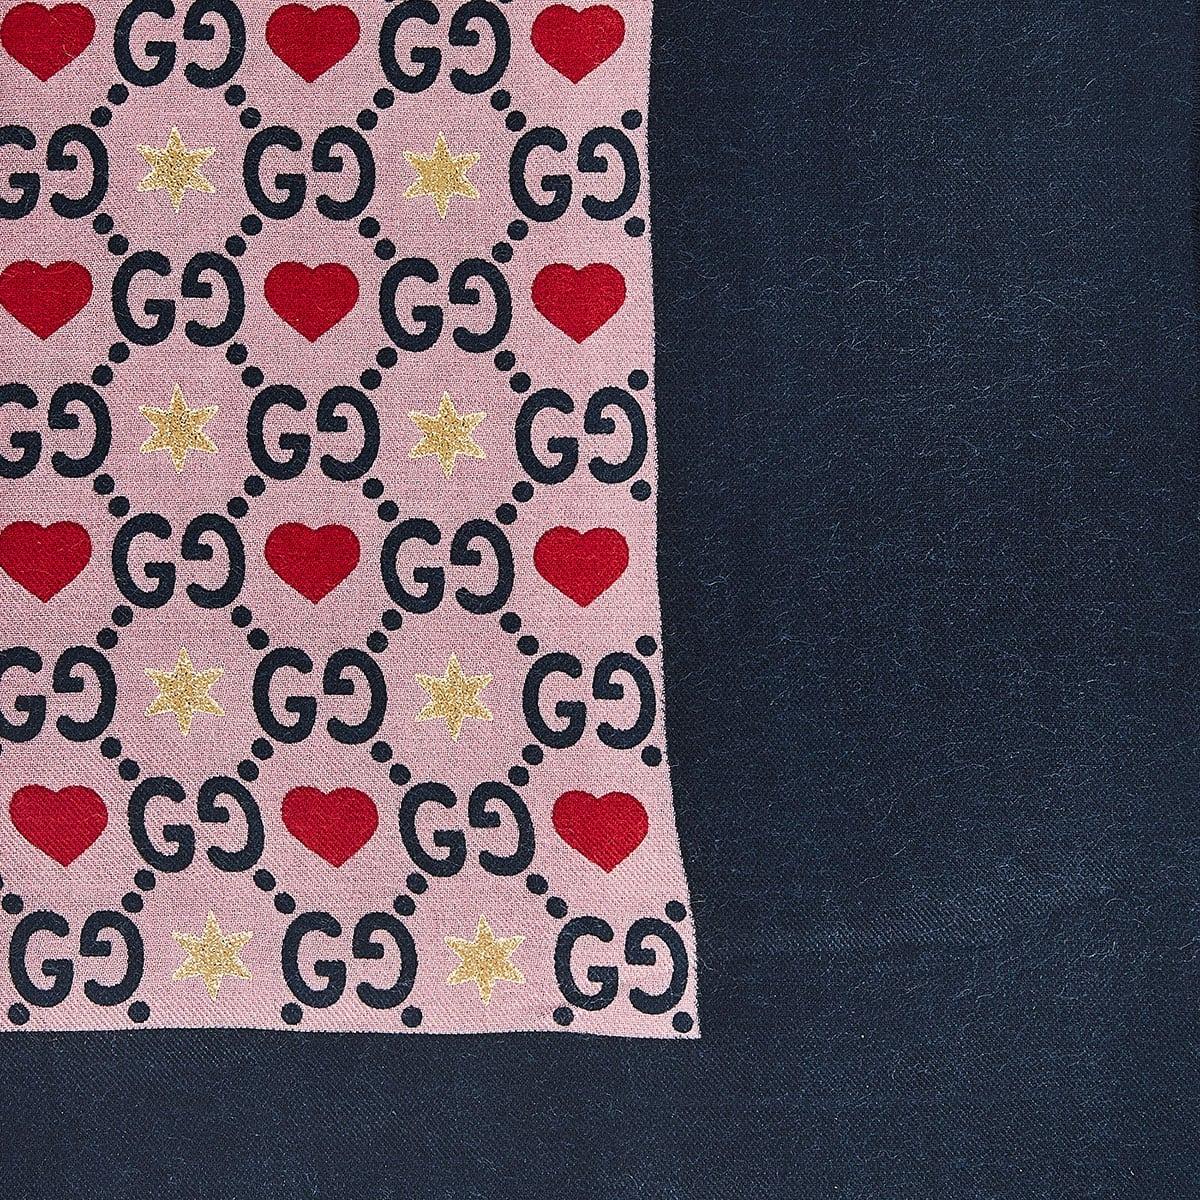 GG printed scarf